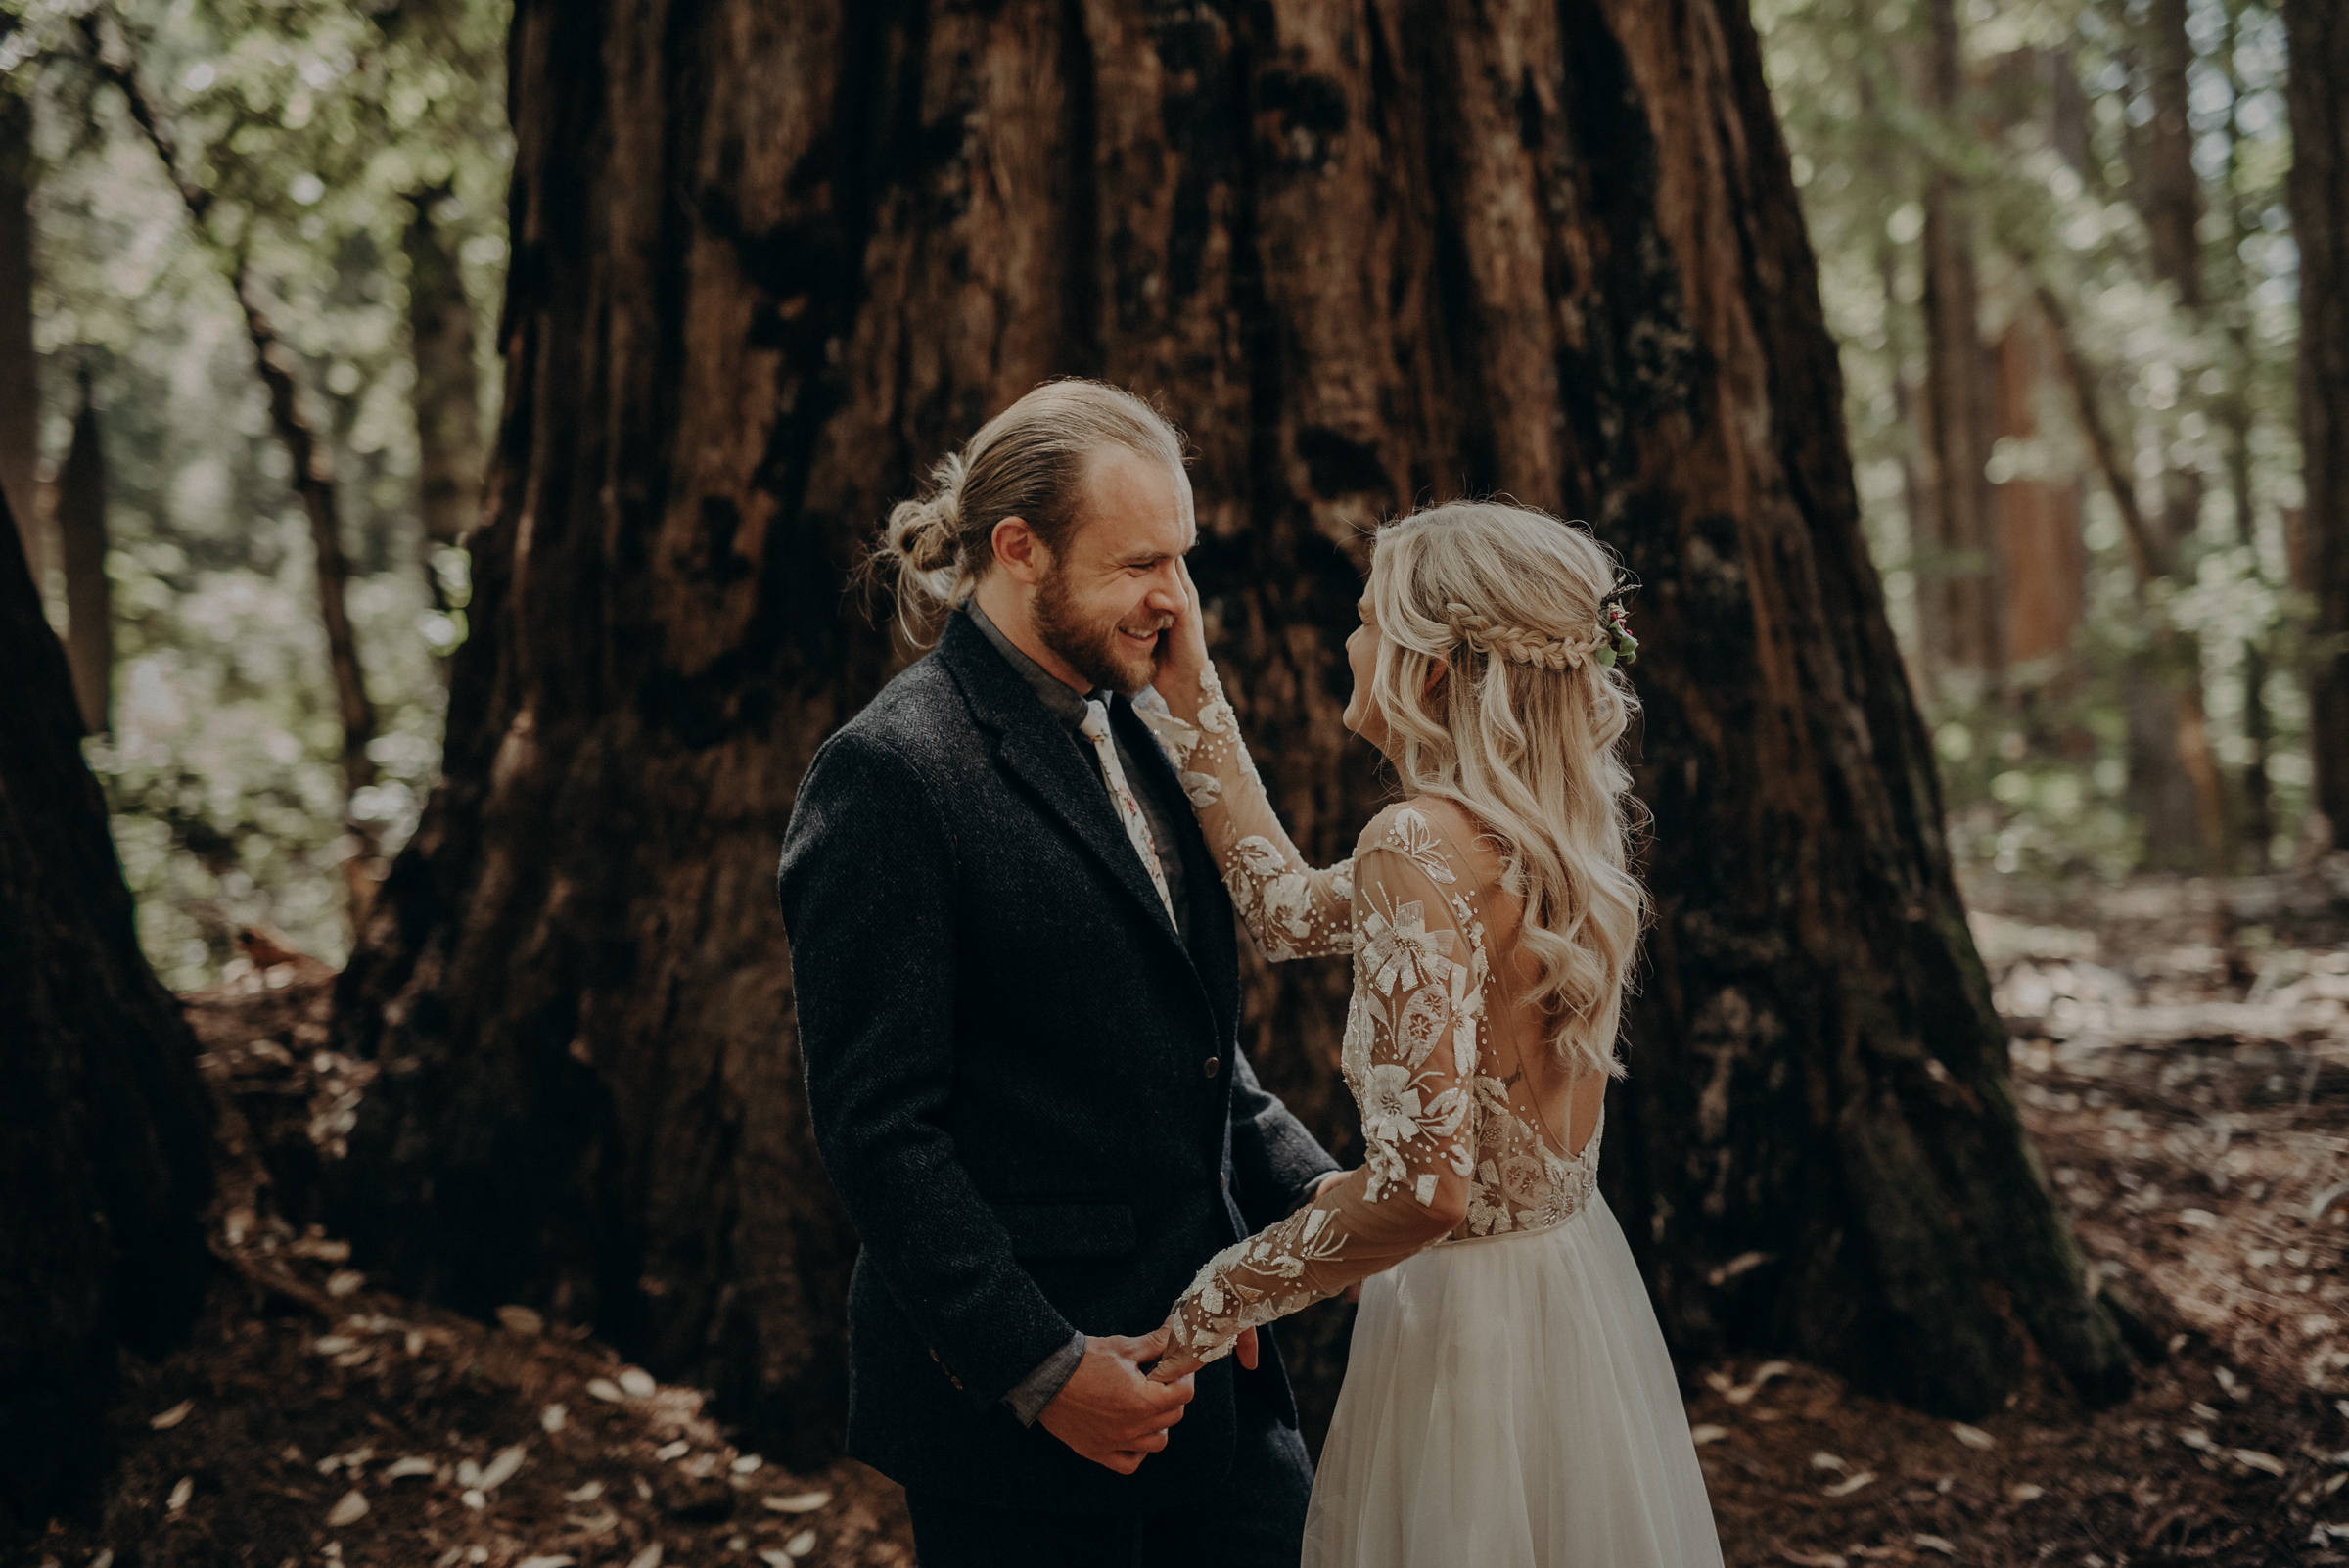 IsaiahAndTaylor.com - California Destination Elopement, Lake Leonard Reserve Wedding, Ukiah-054.jpg